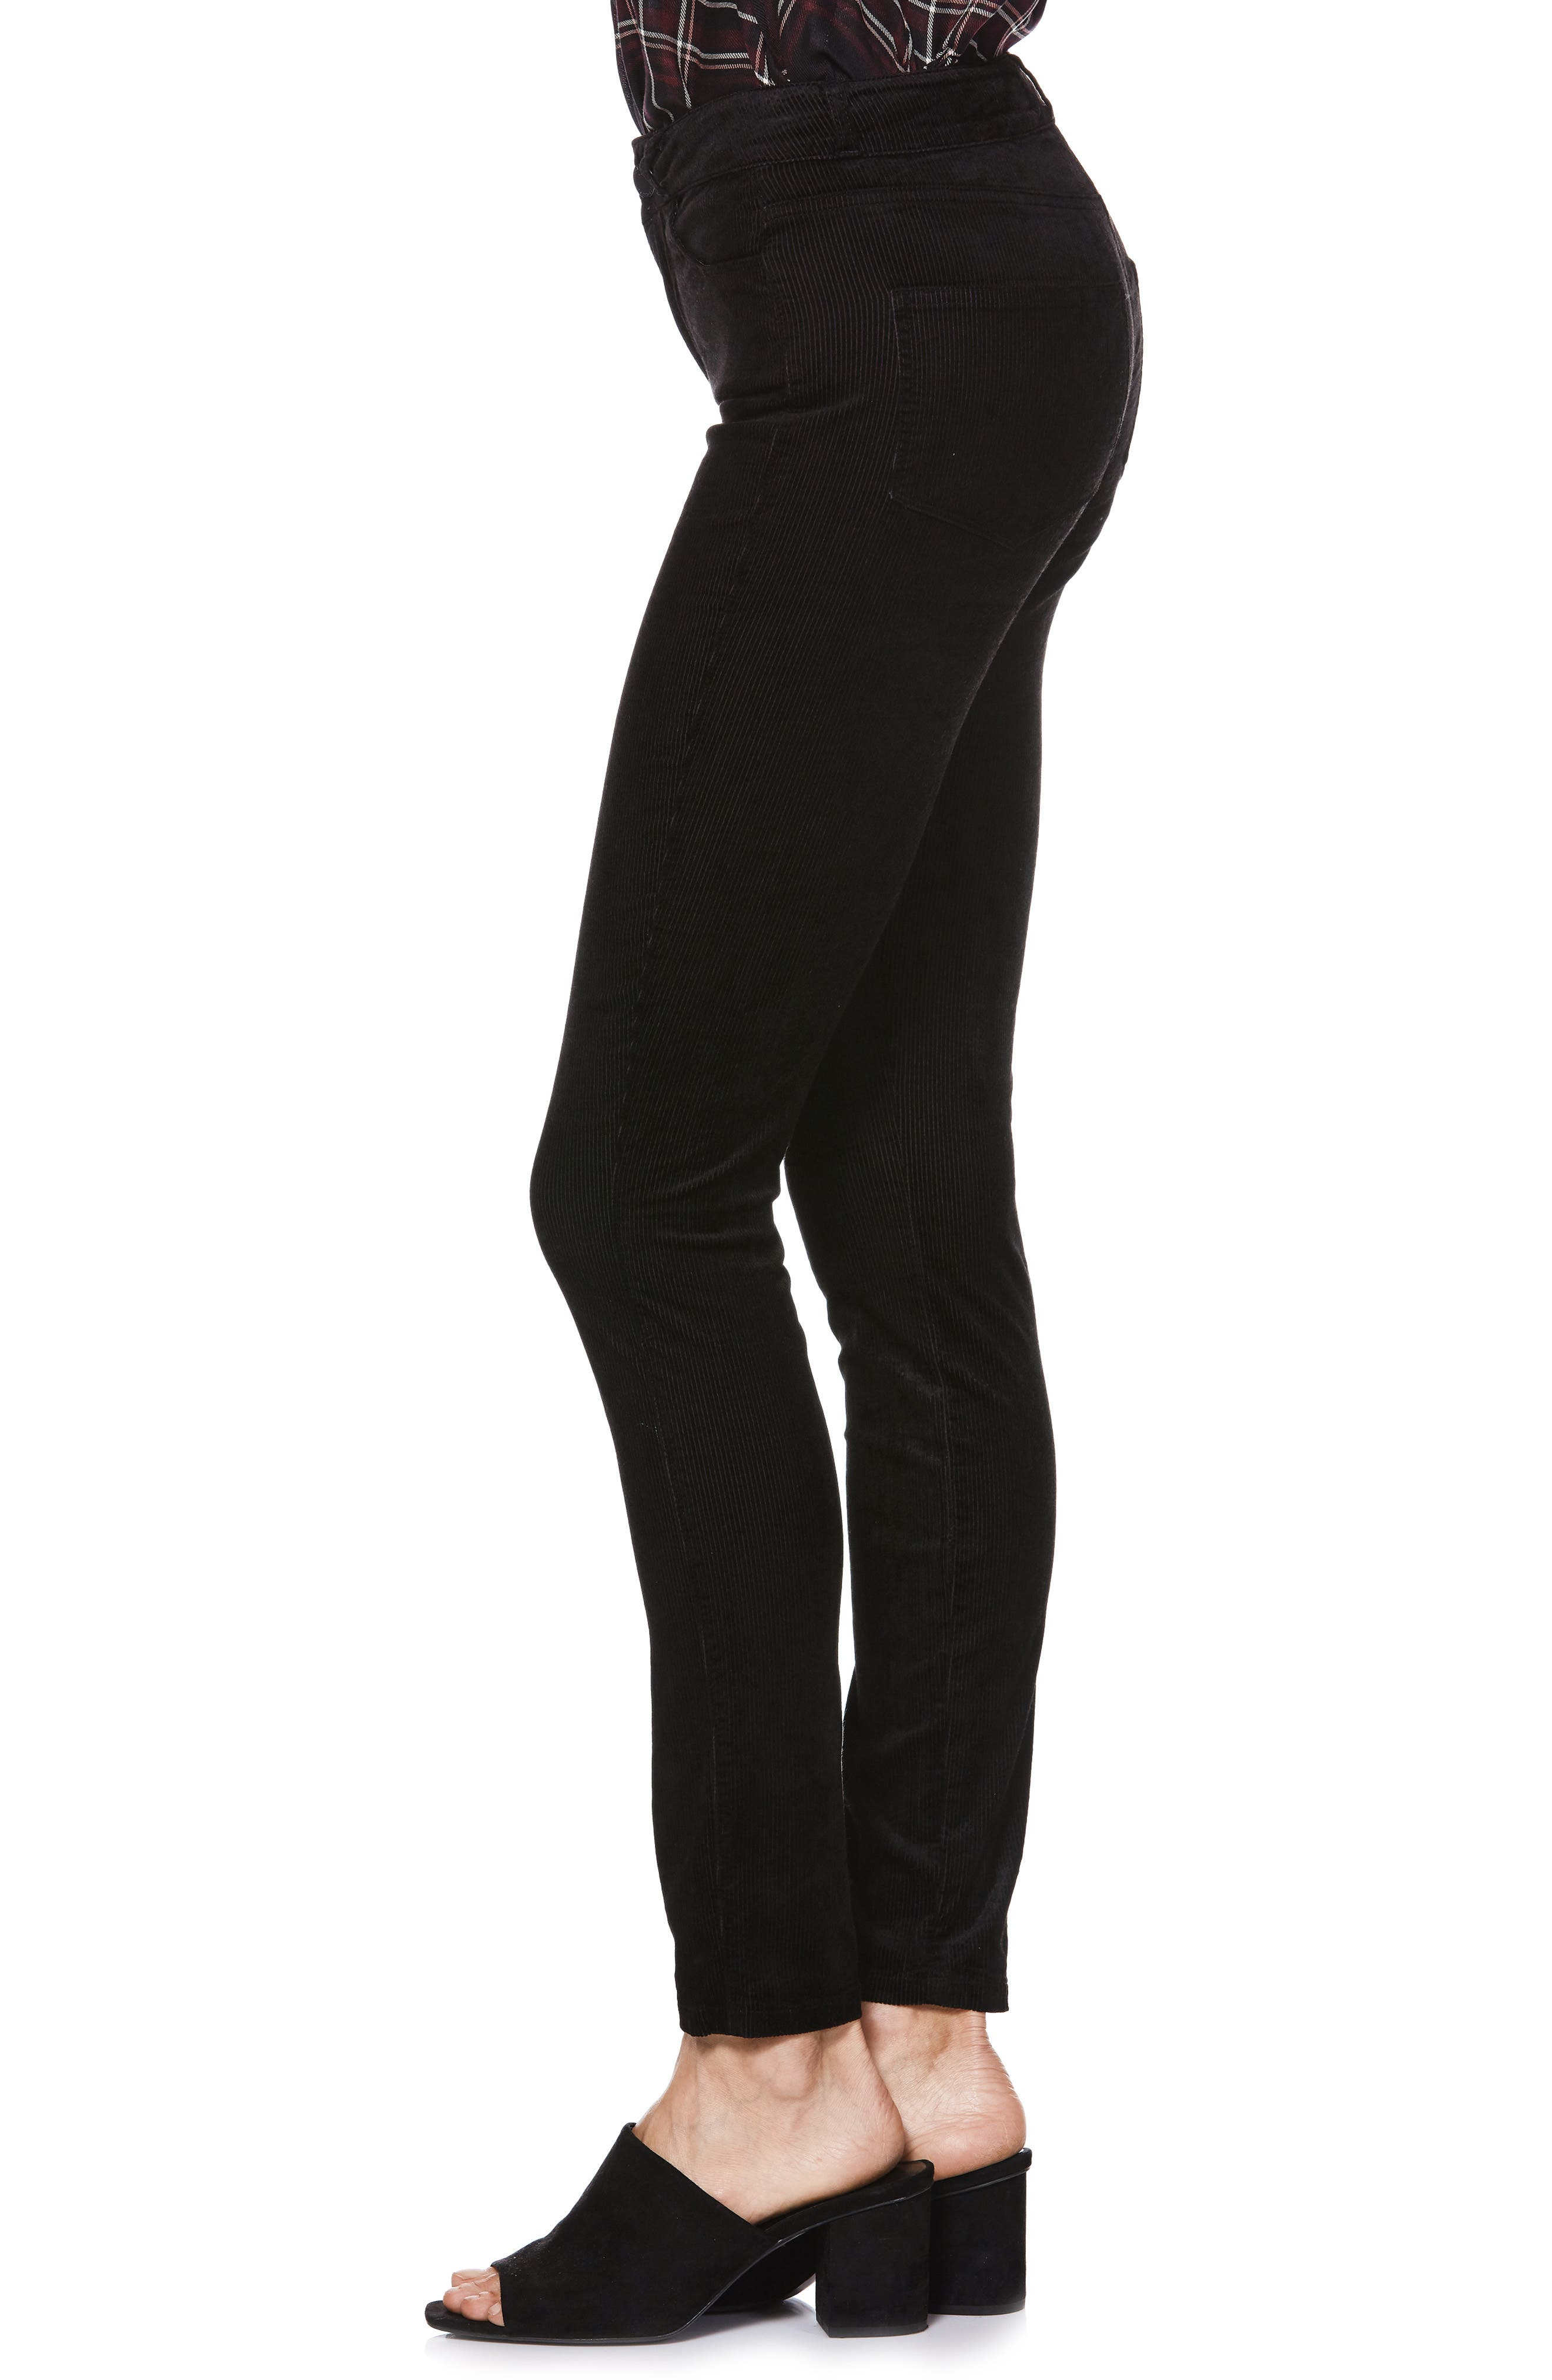 Transcend - Hoxton High Waist Ultra Skinny Jeans,                             Alternate thumbnail 3, color,                             001